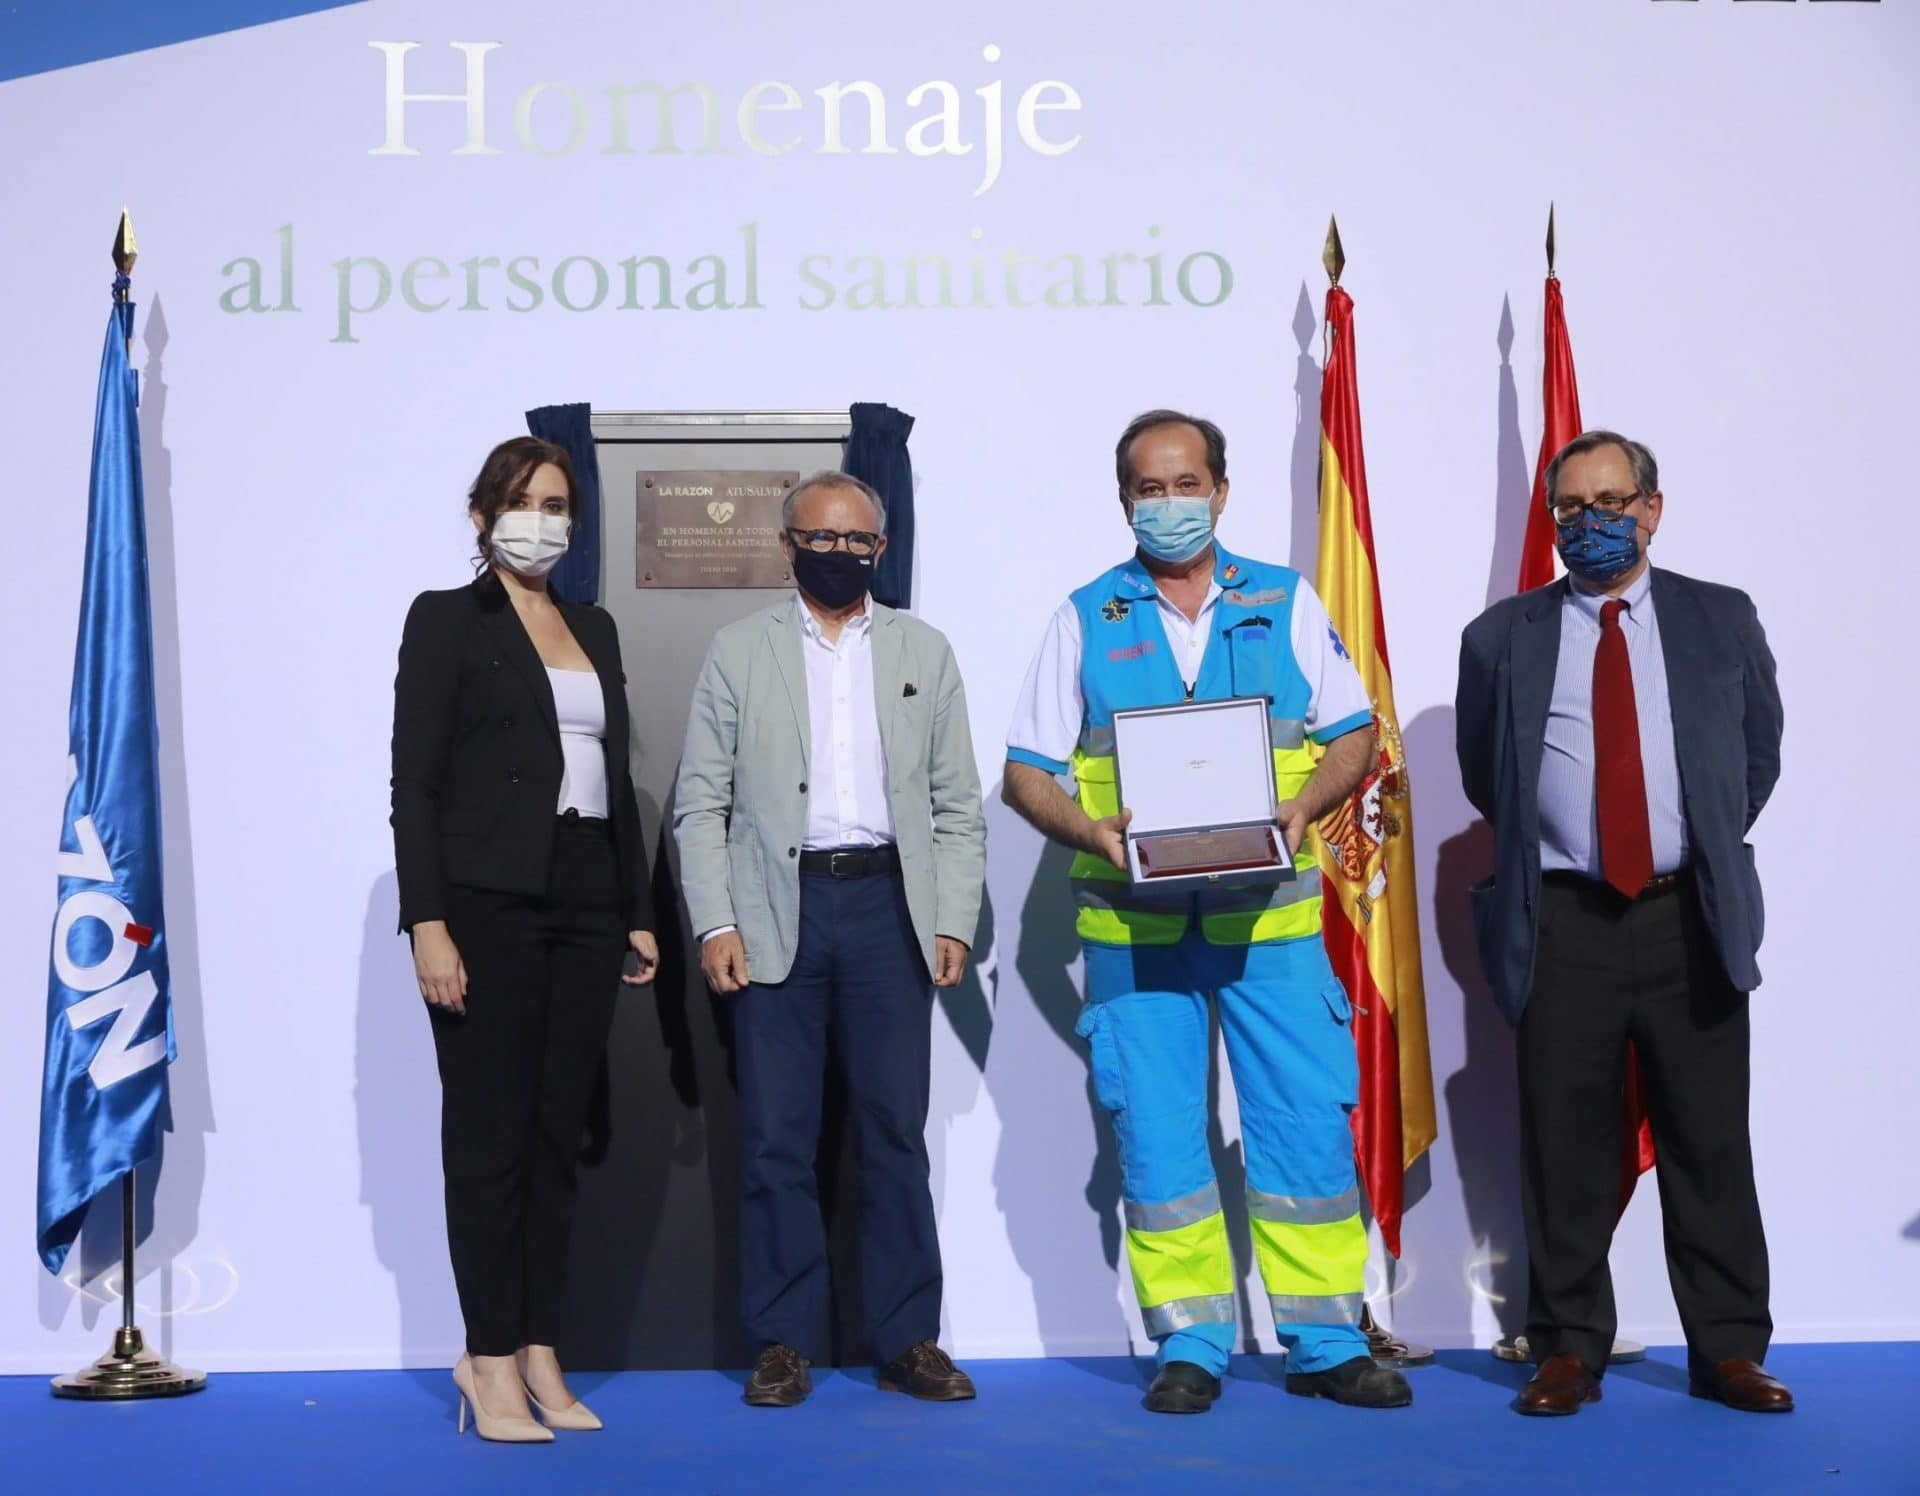 Awards healthcare workers La Razon Covid19